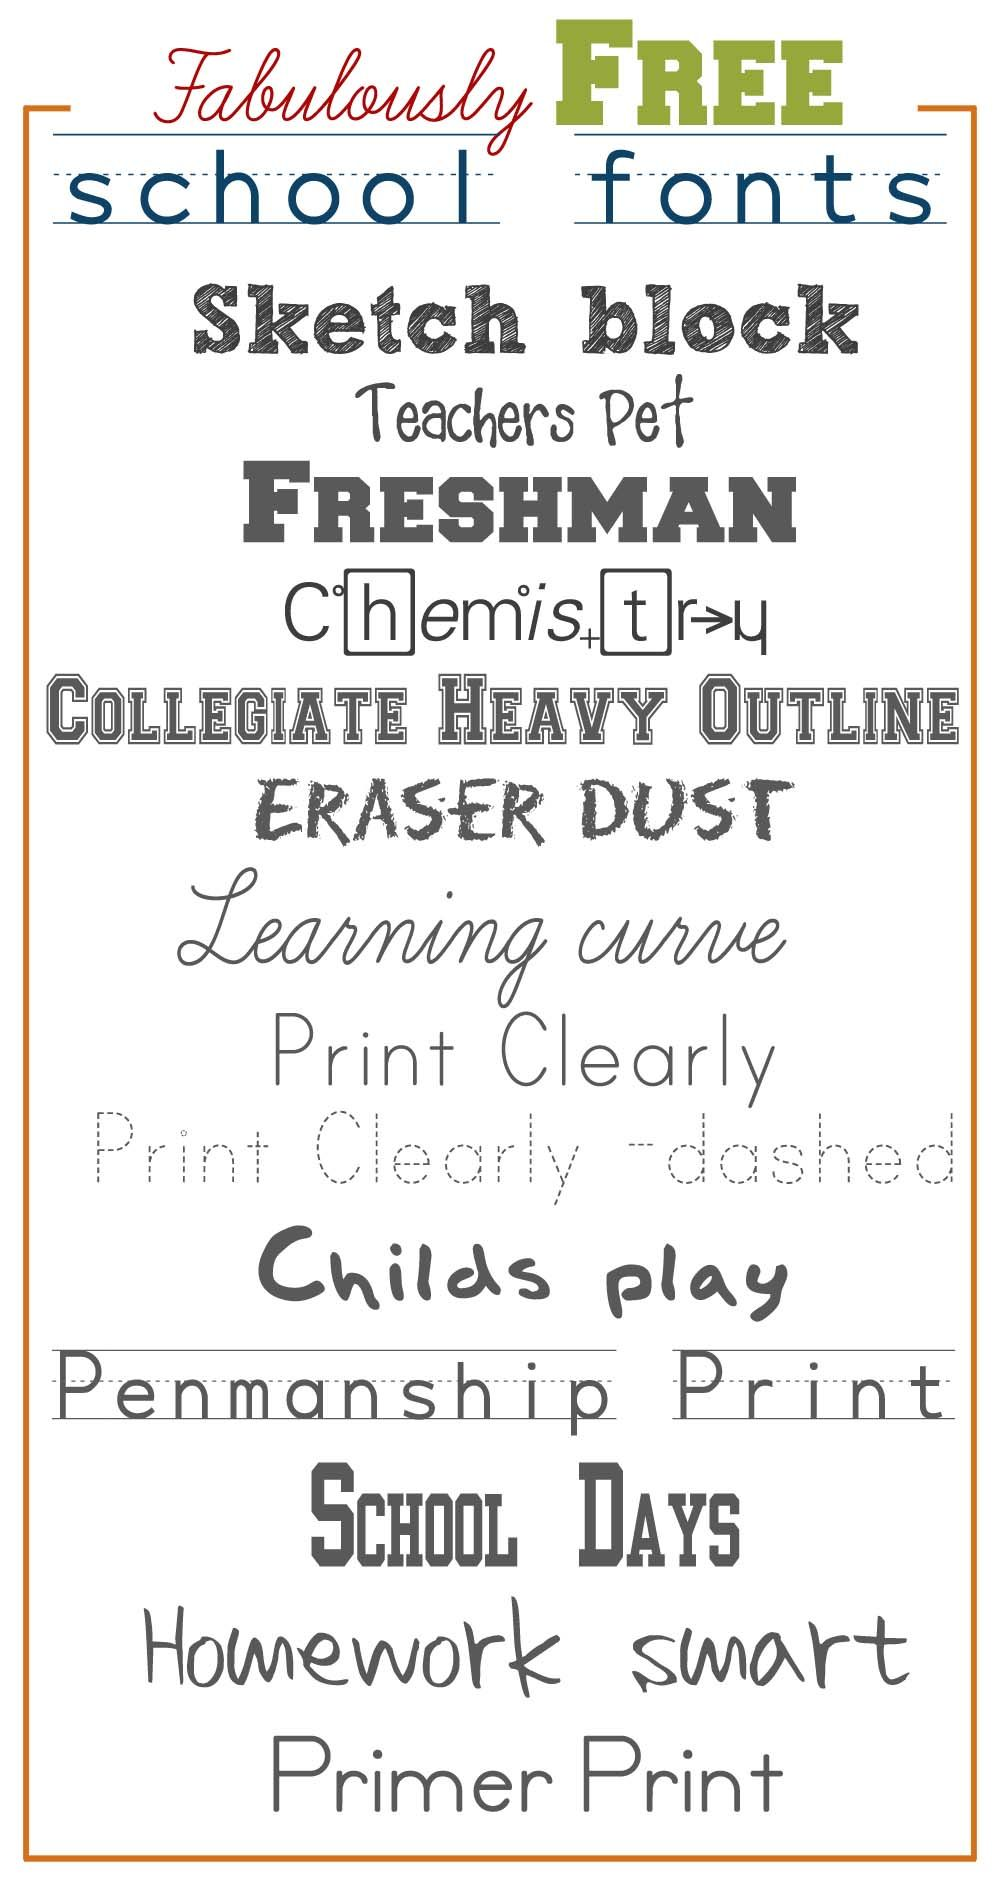 Fabulously Free School Fonts Pinterest School Fonts Fonts And